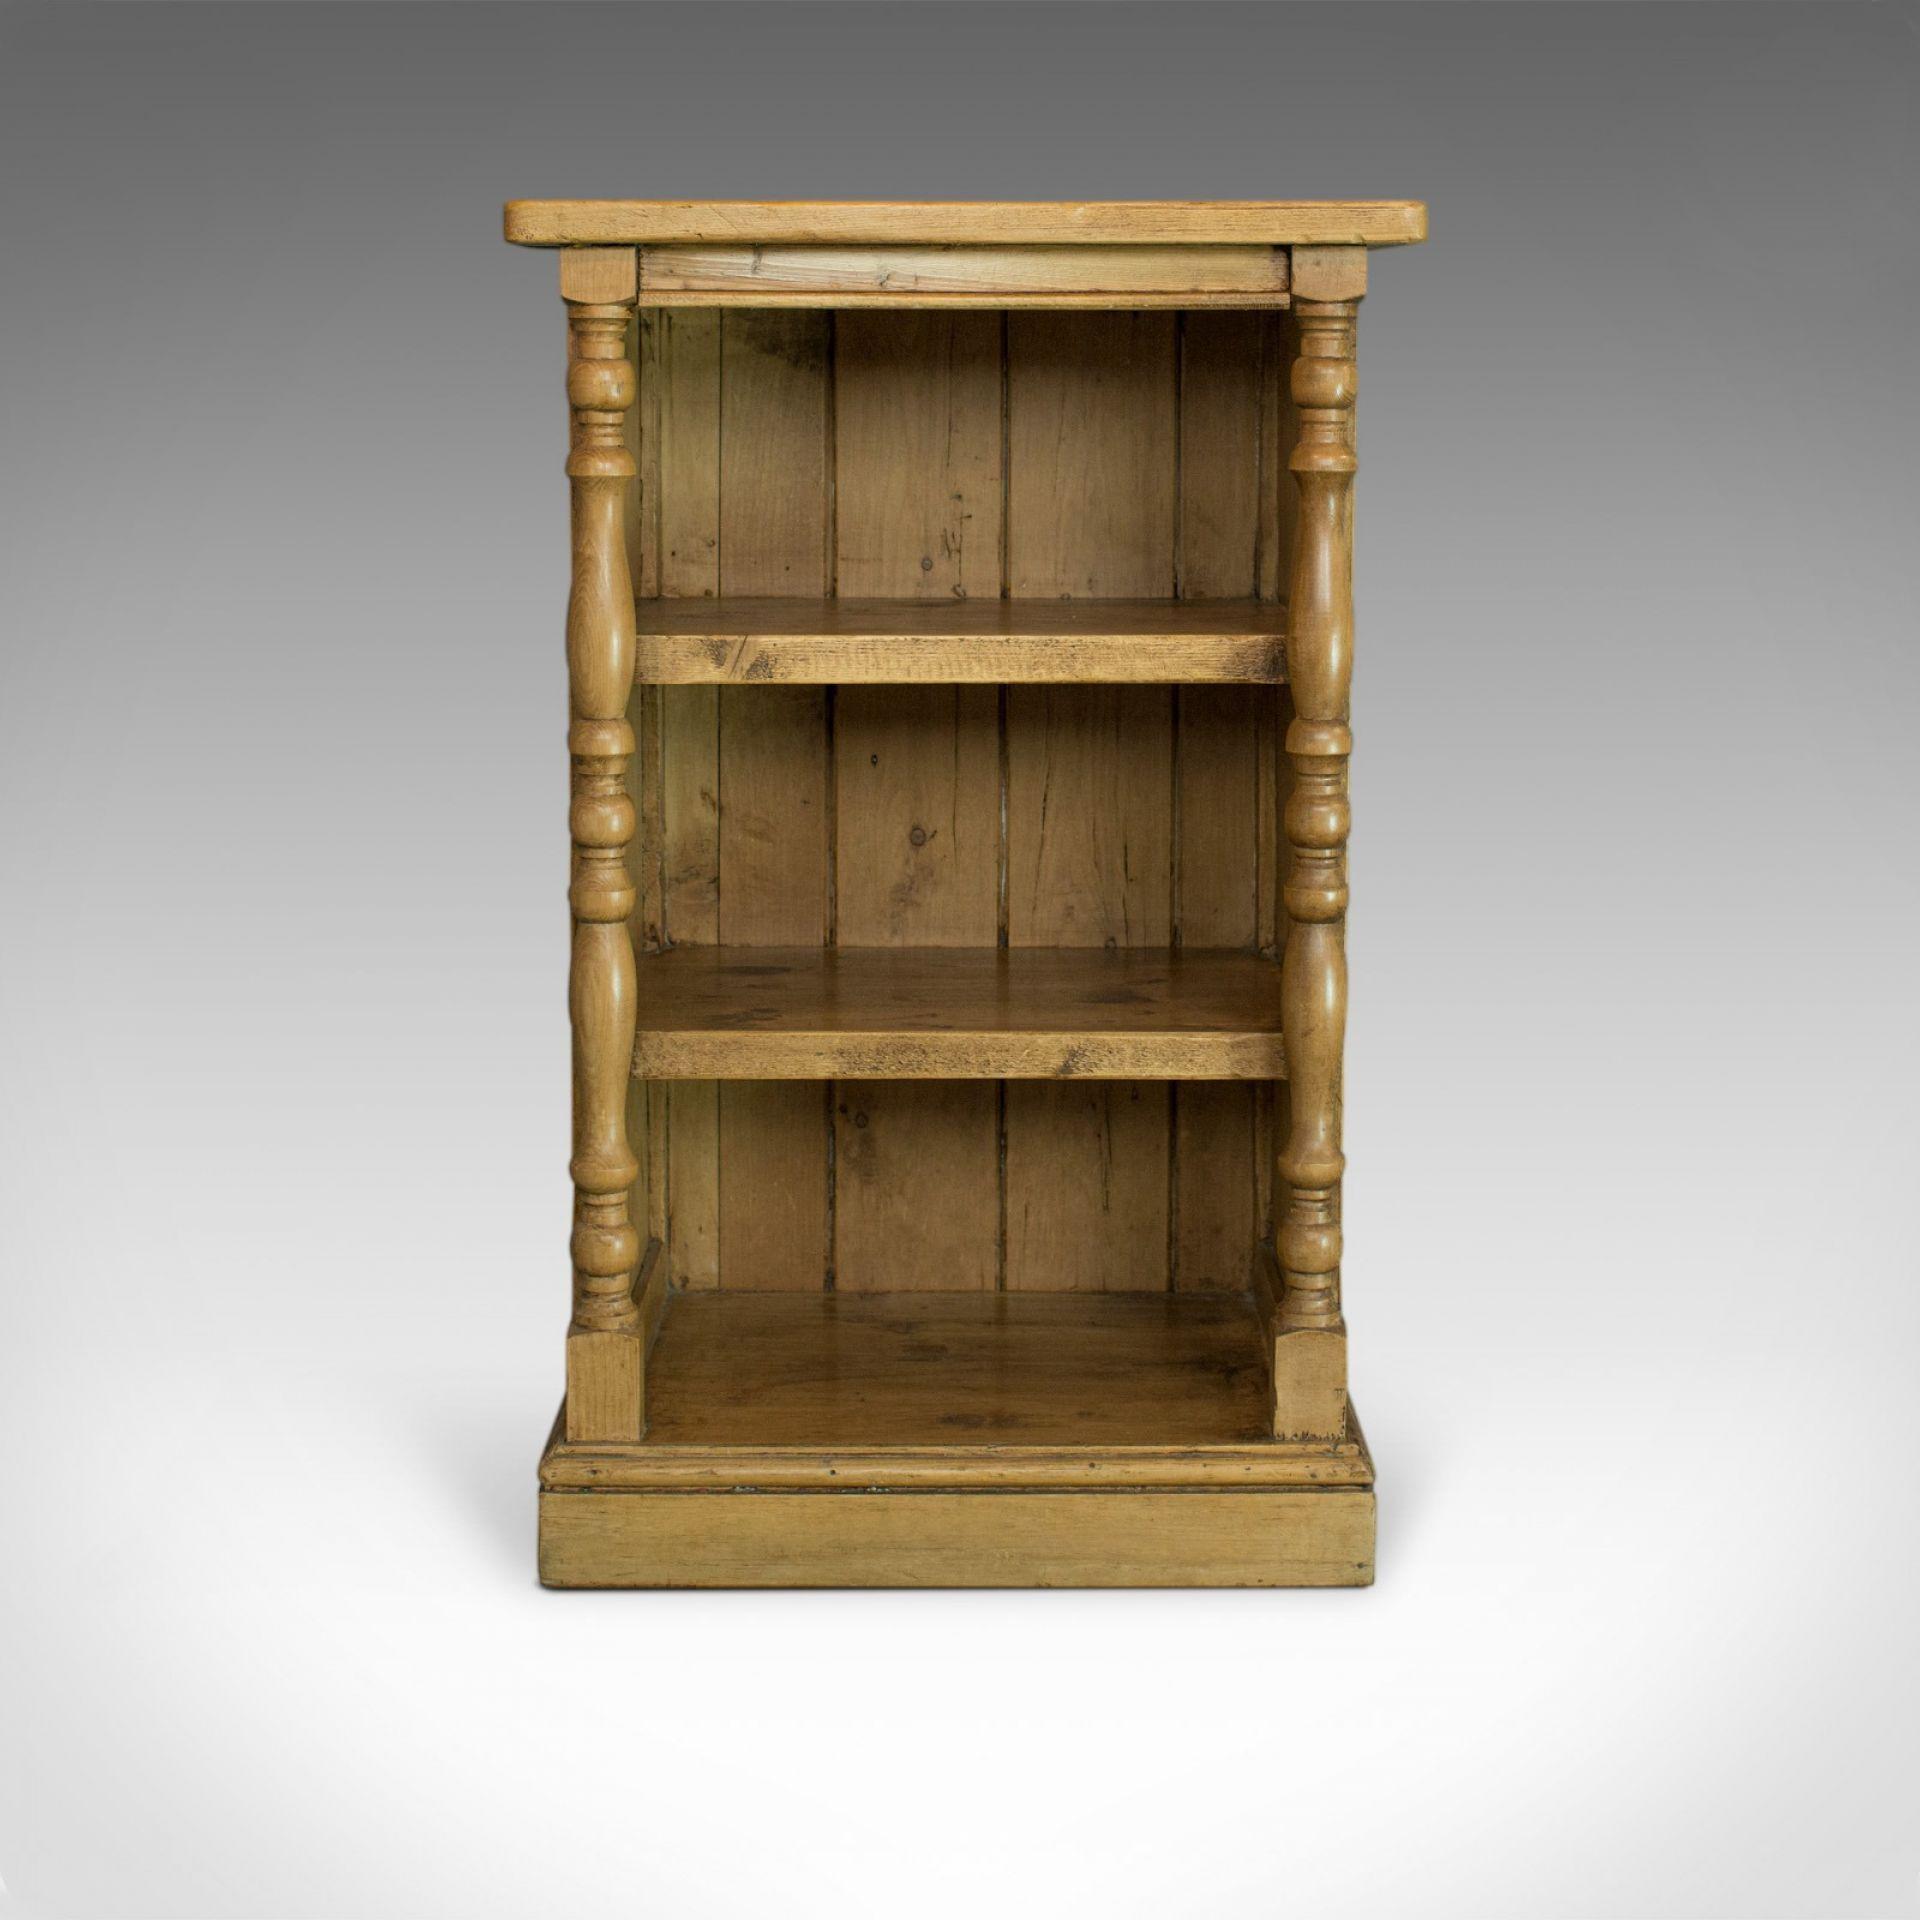 Antique Pine Open Bookcase, Narrow, English, Victorian, Bookshelf, Circa 1900